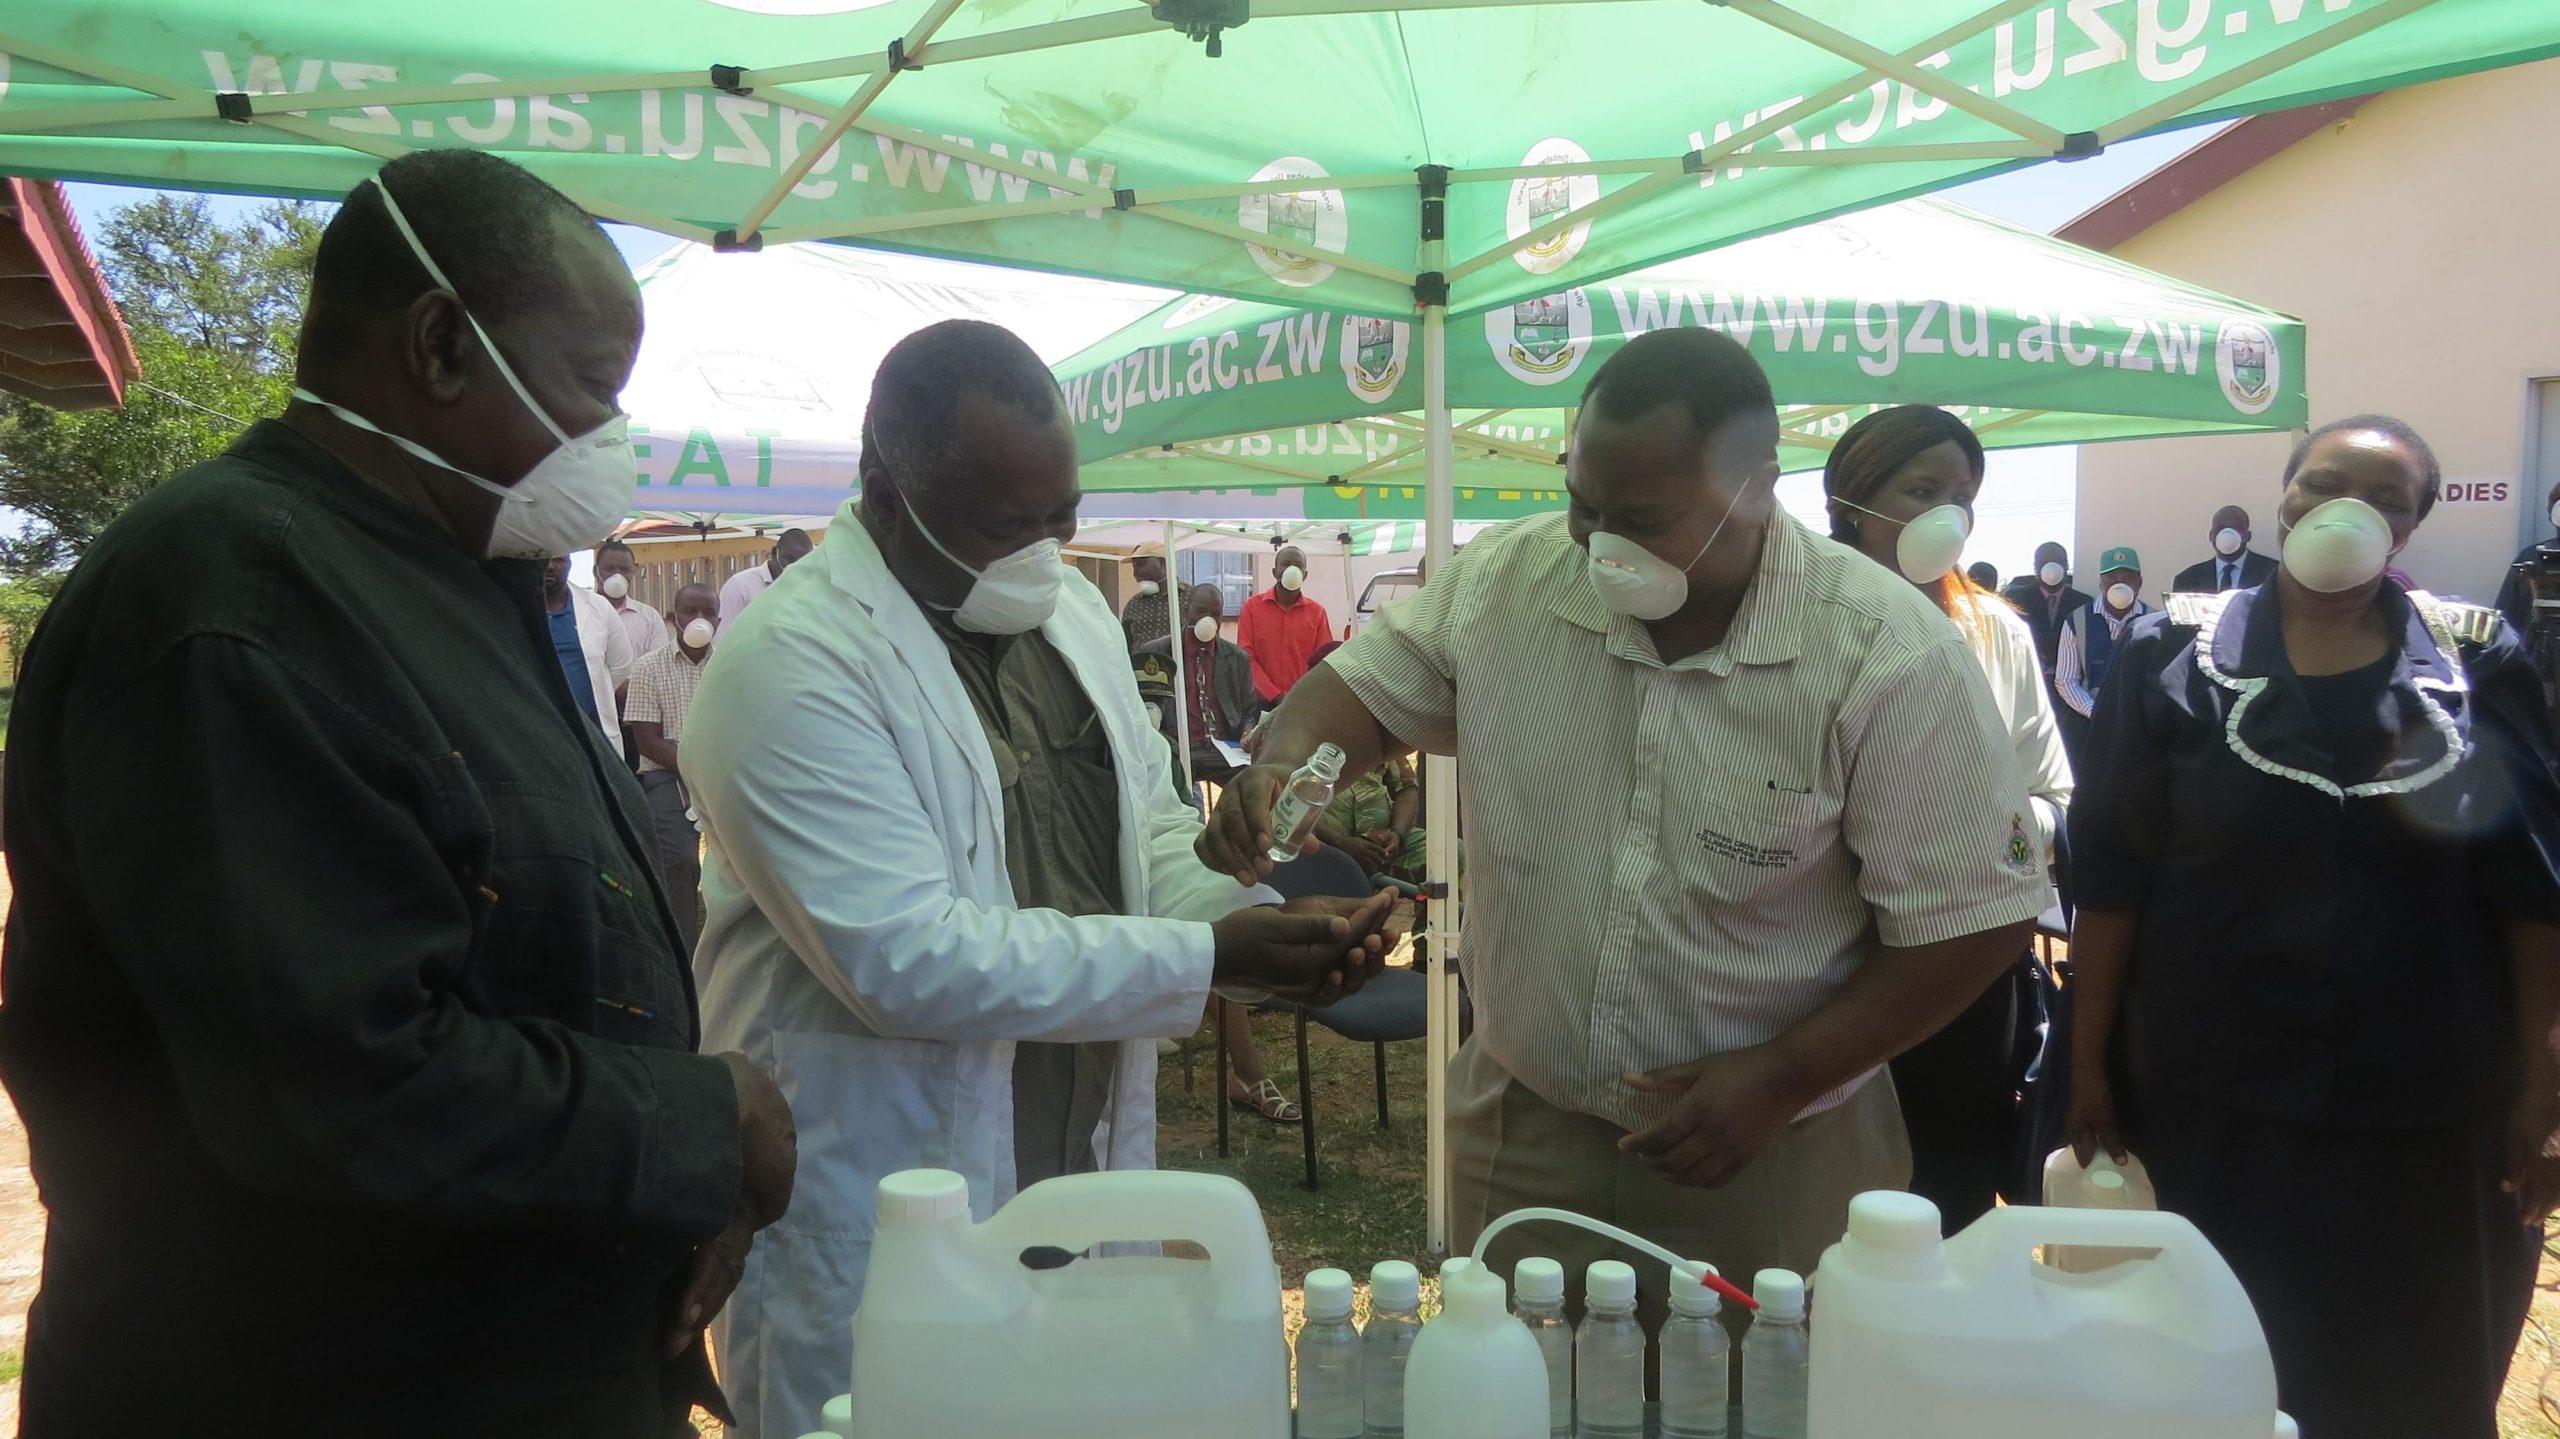 Coronavirus: Zimbabwe universities making face masks, gloves